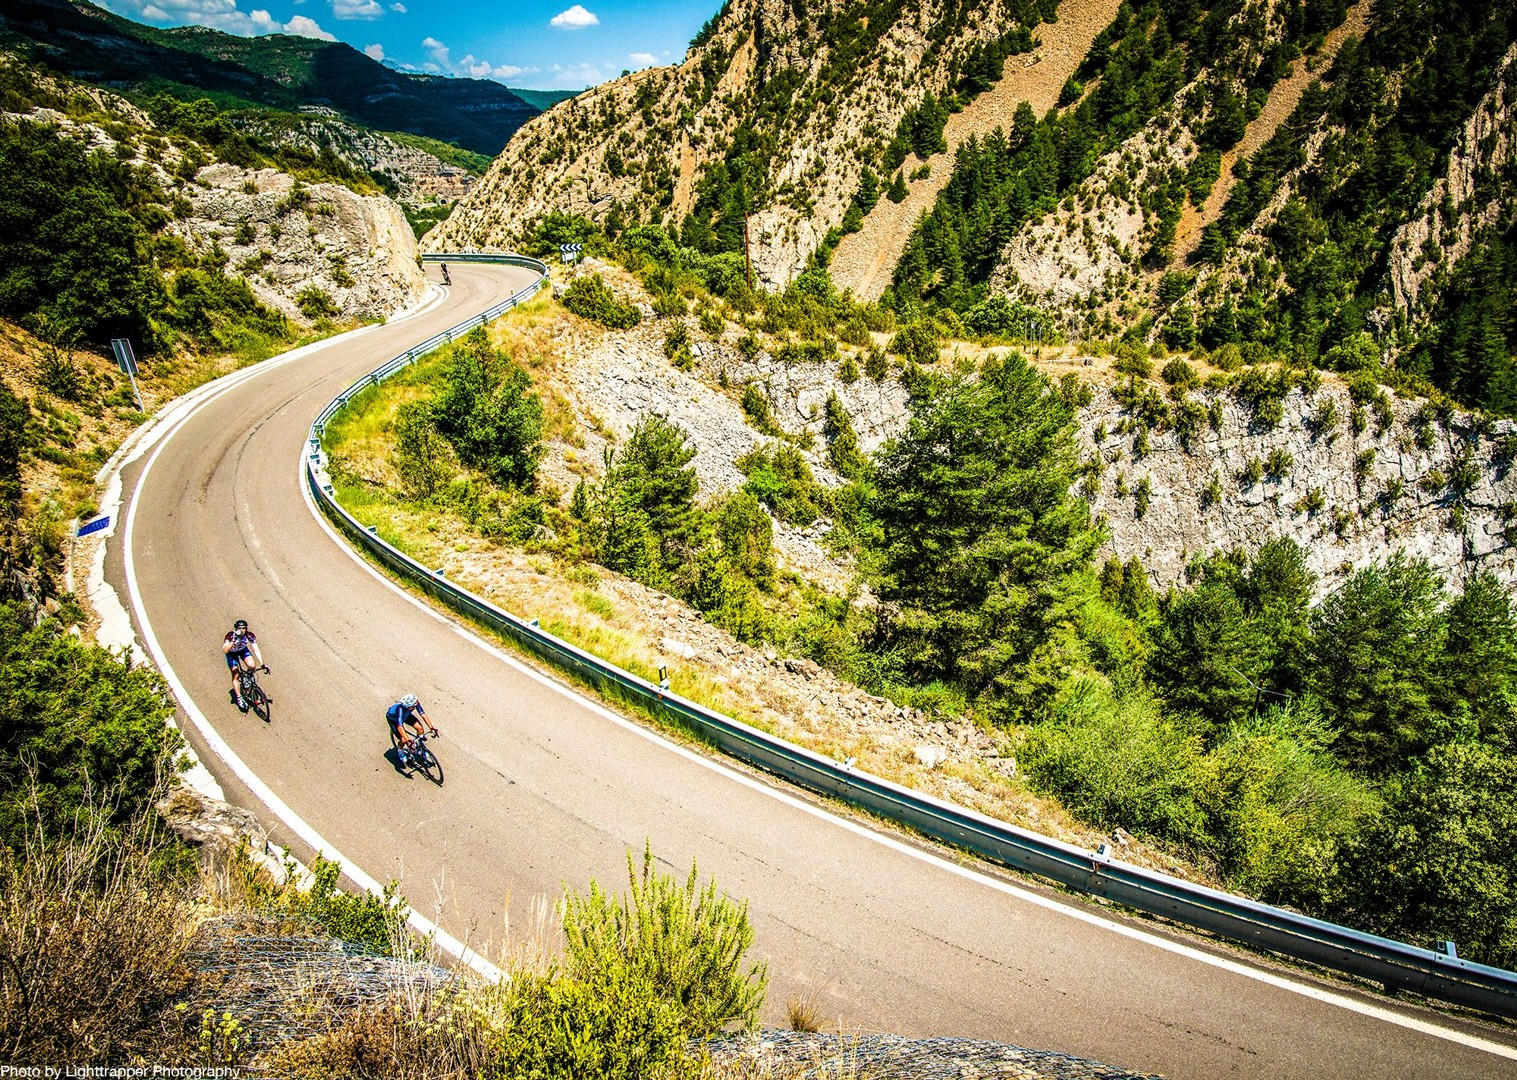 cycling-spanish-pyrenees-coast-to-coast-road-holiday.jpg - NEW! Spain - Spanish Pyrenees Coast to Coast - Road Cycling